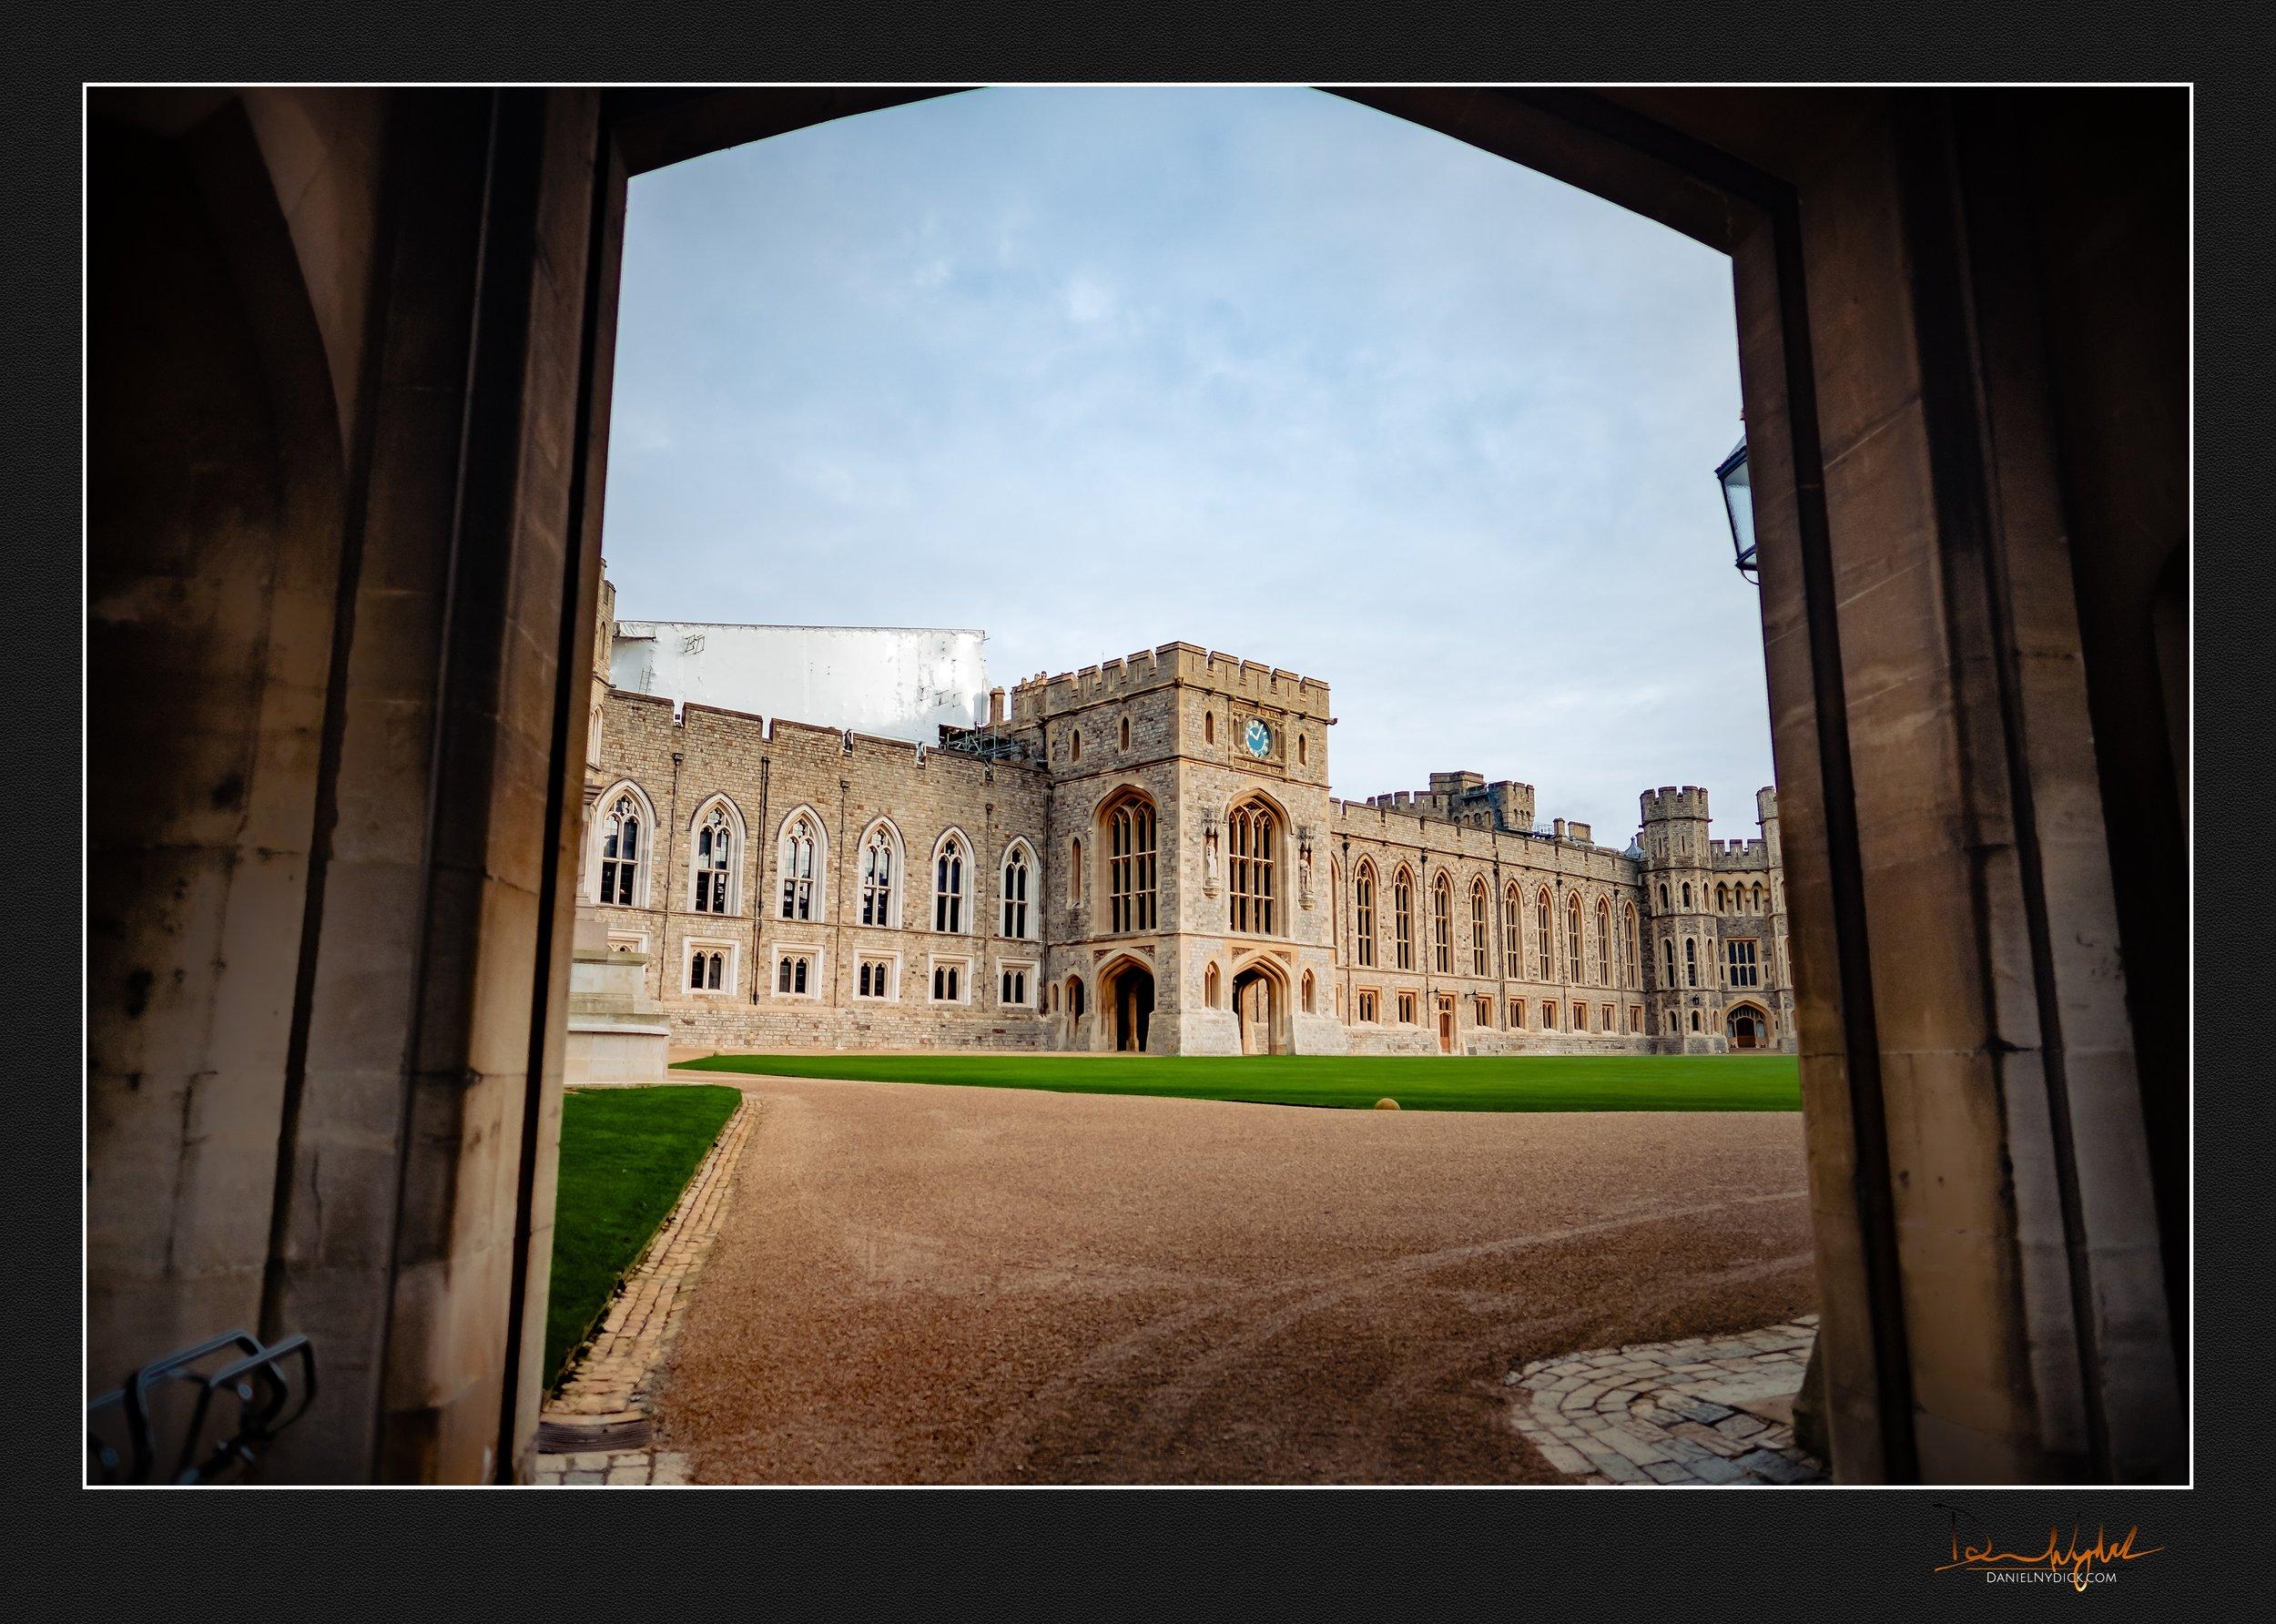 windor castle, wide view,